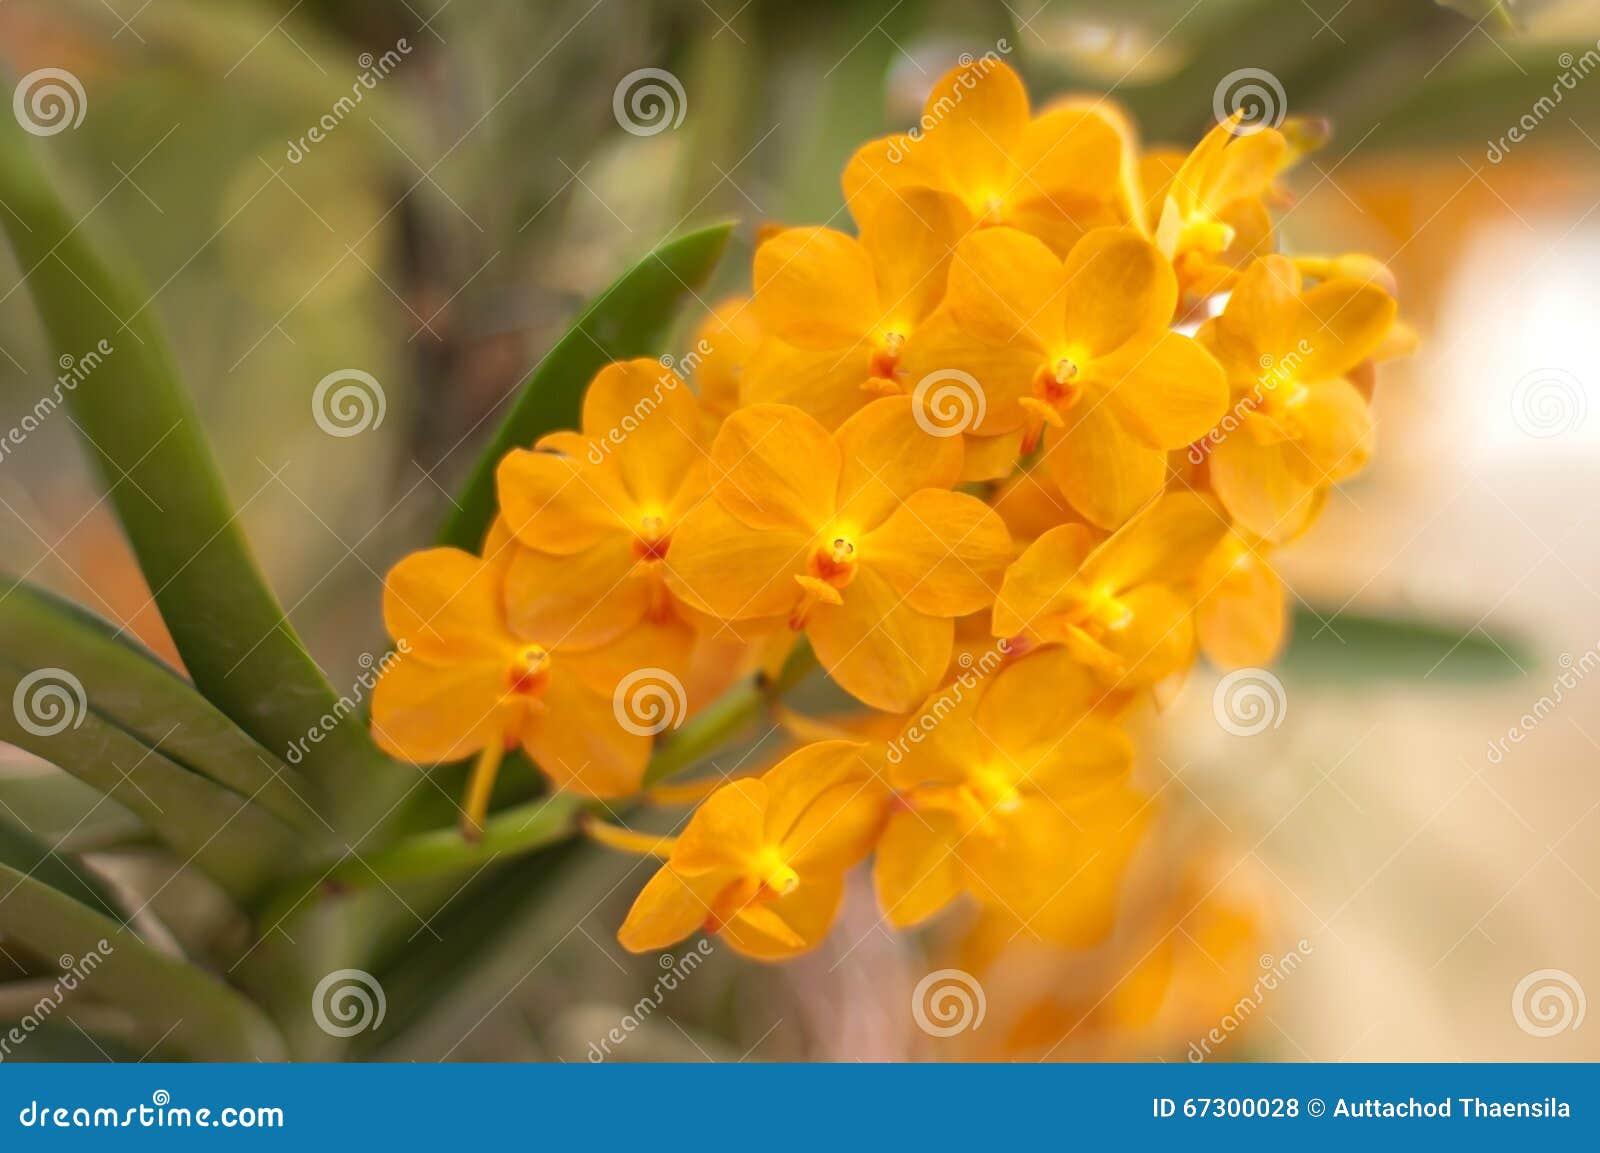 Orchidea arancione